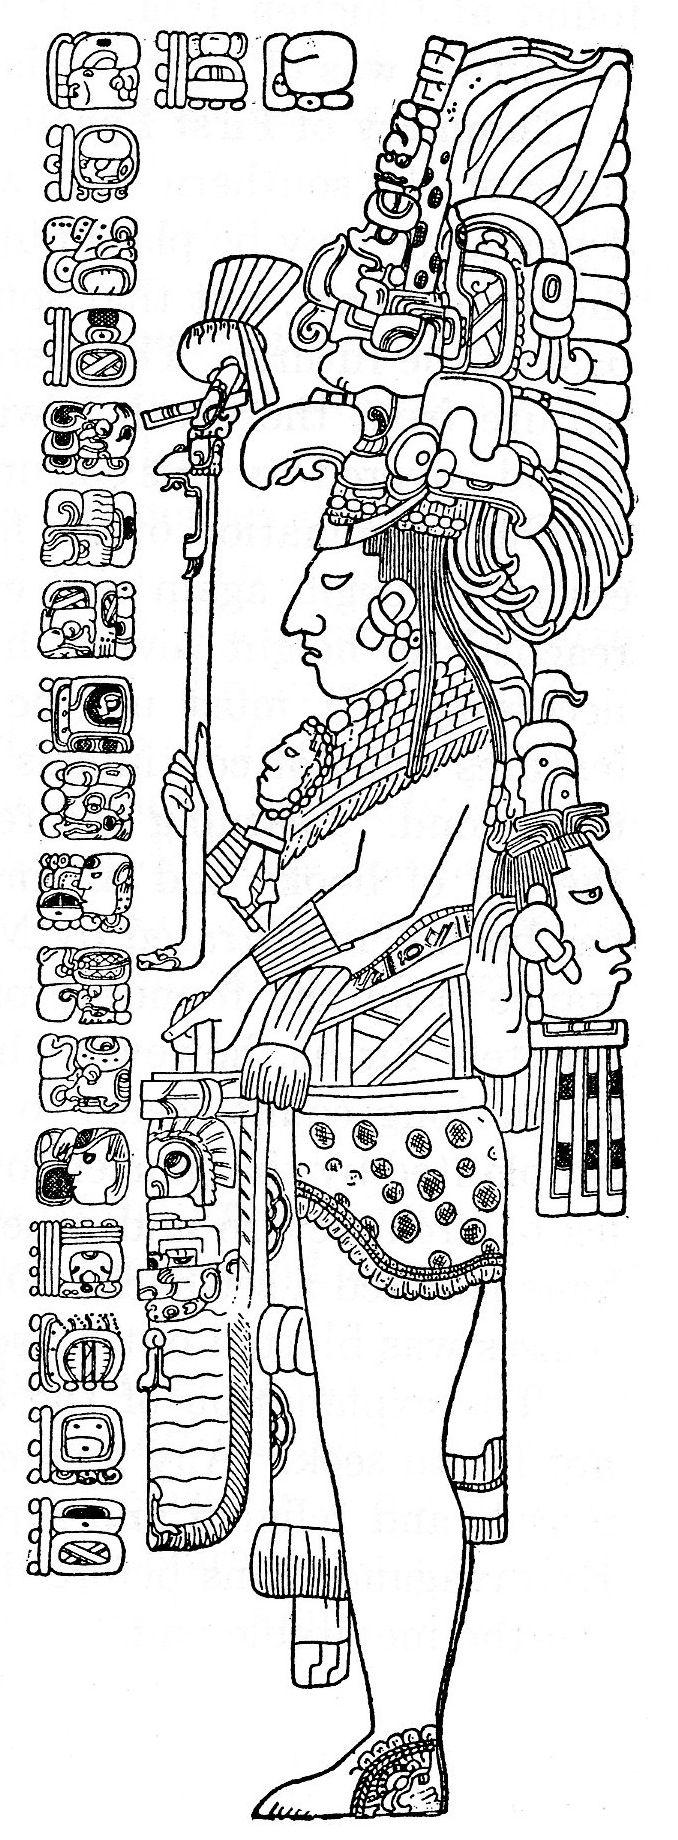 hieroglyphic sculpture - Google Search